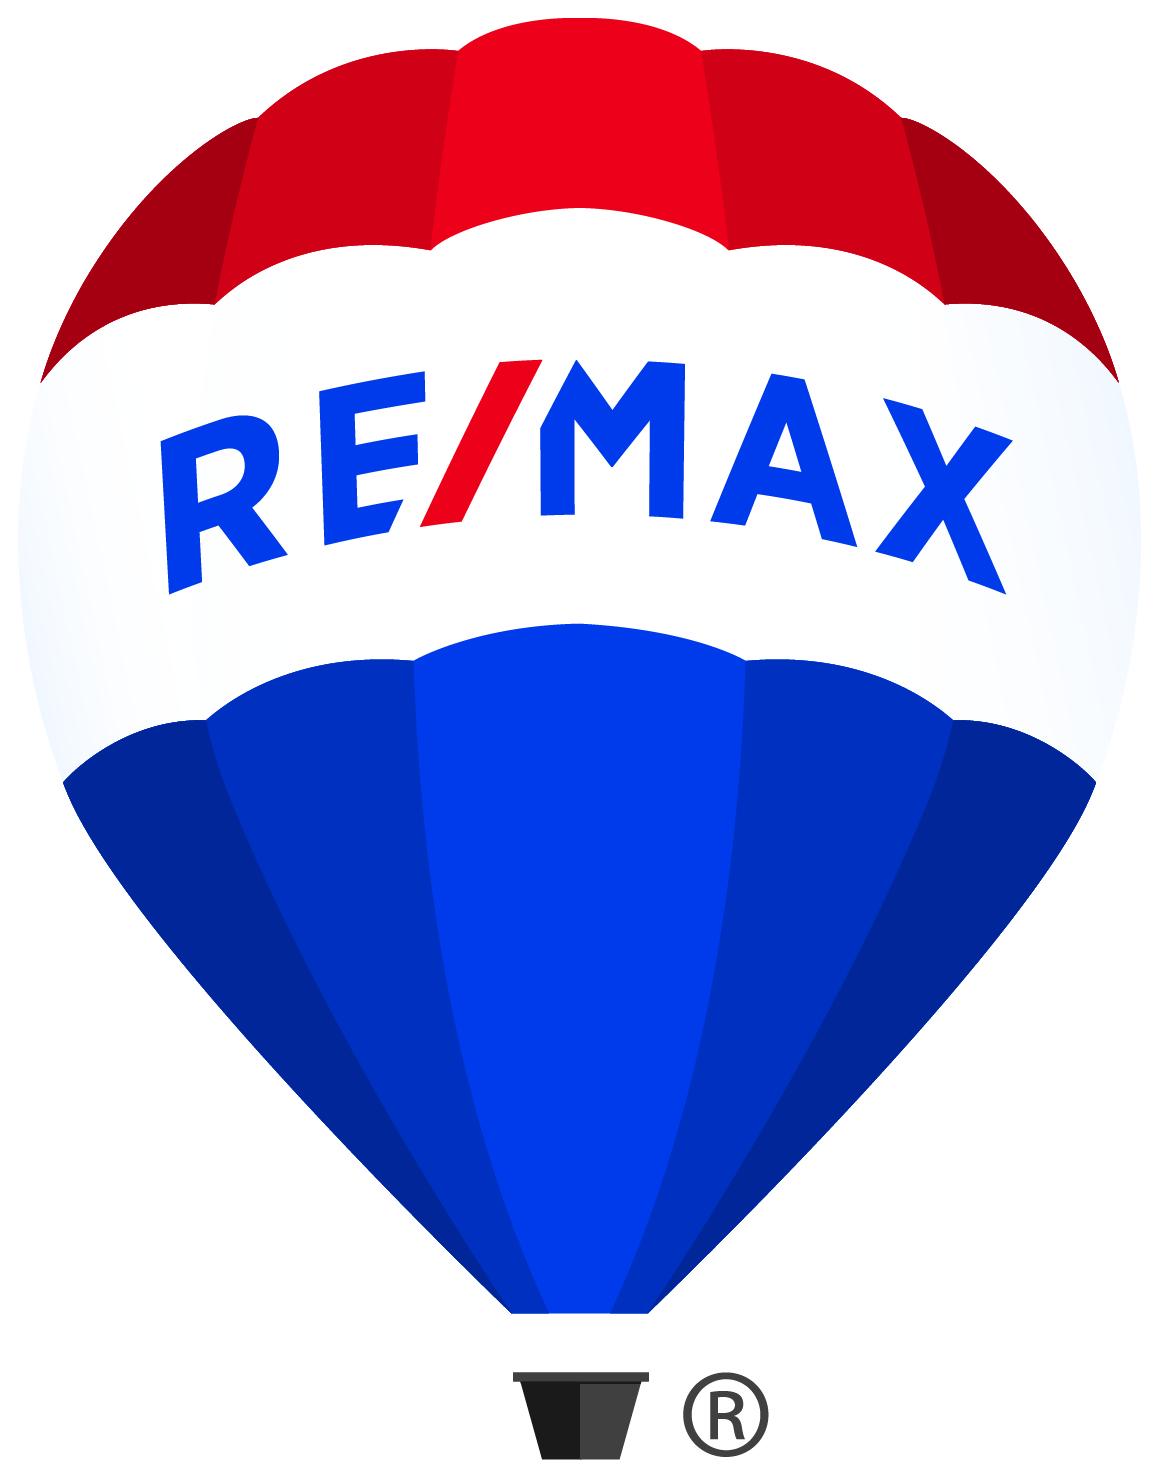 RE/MAX balloon .jpg high resolution